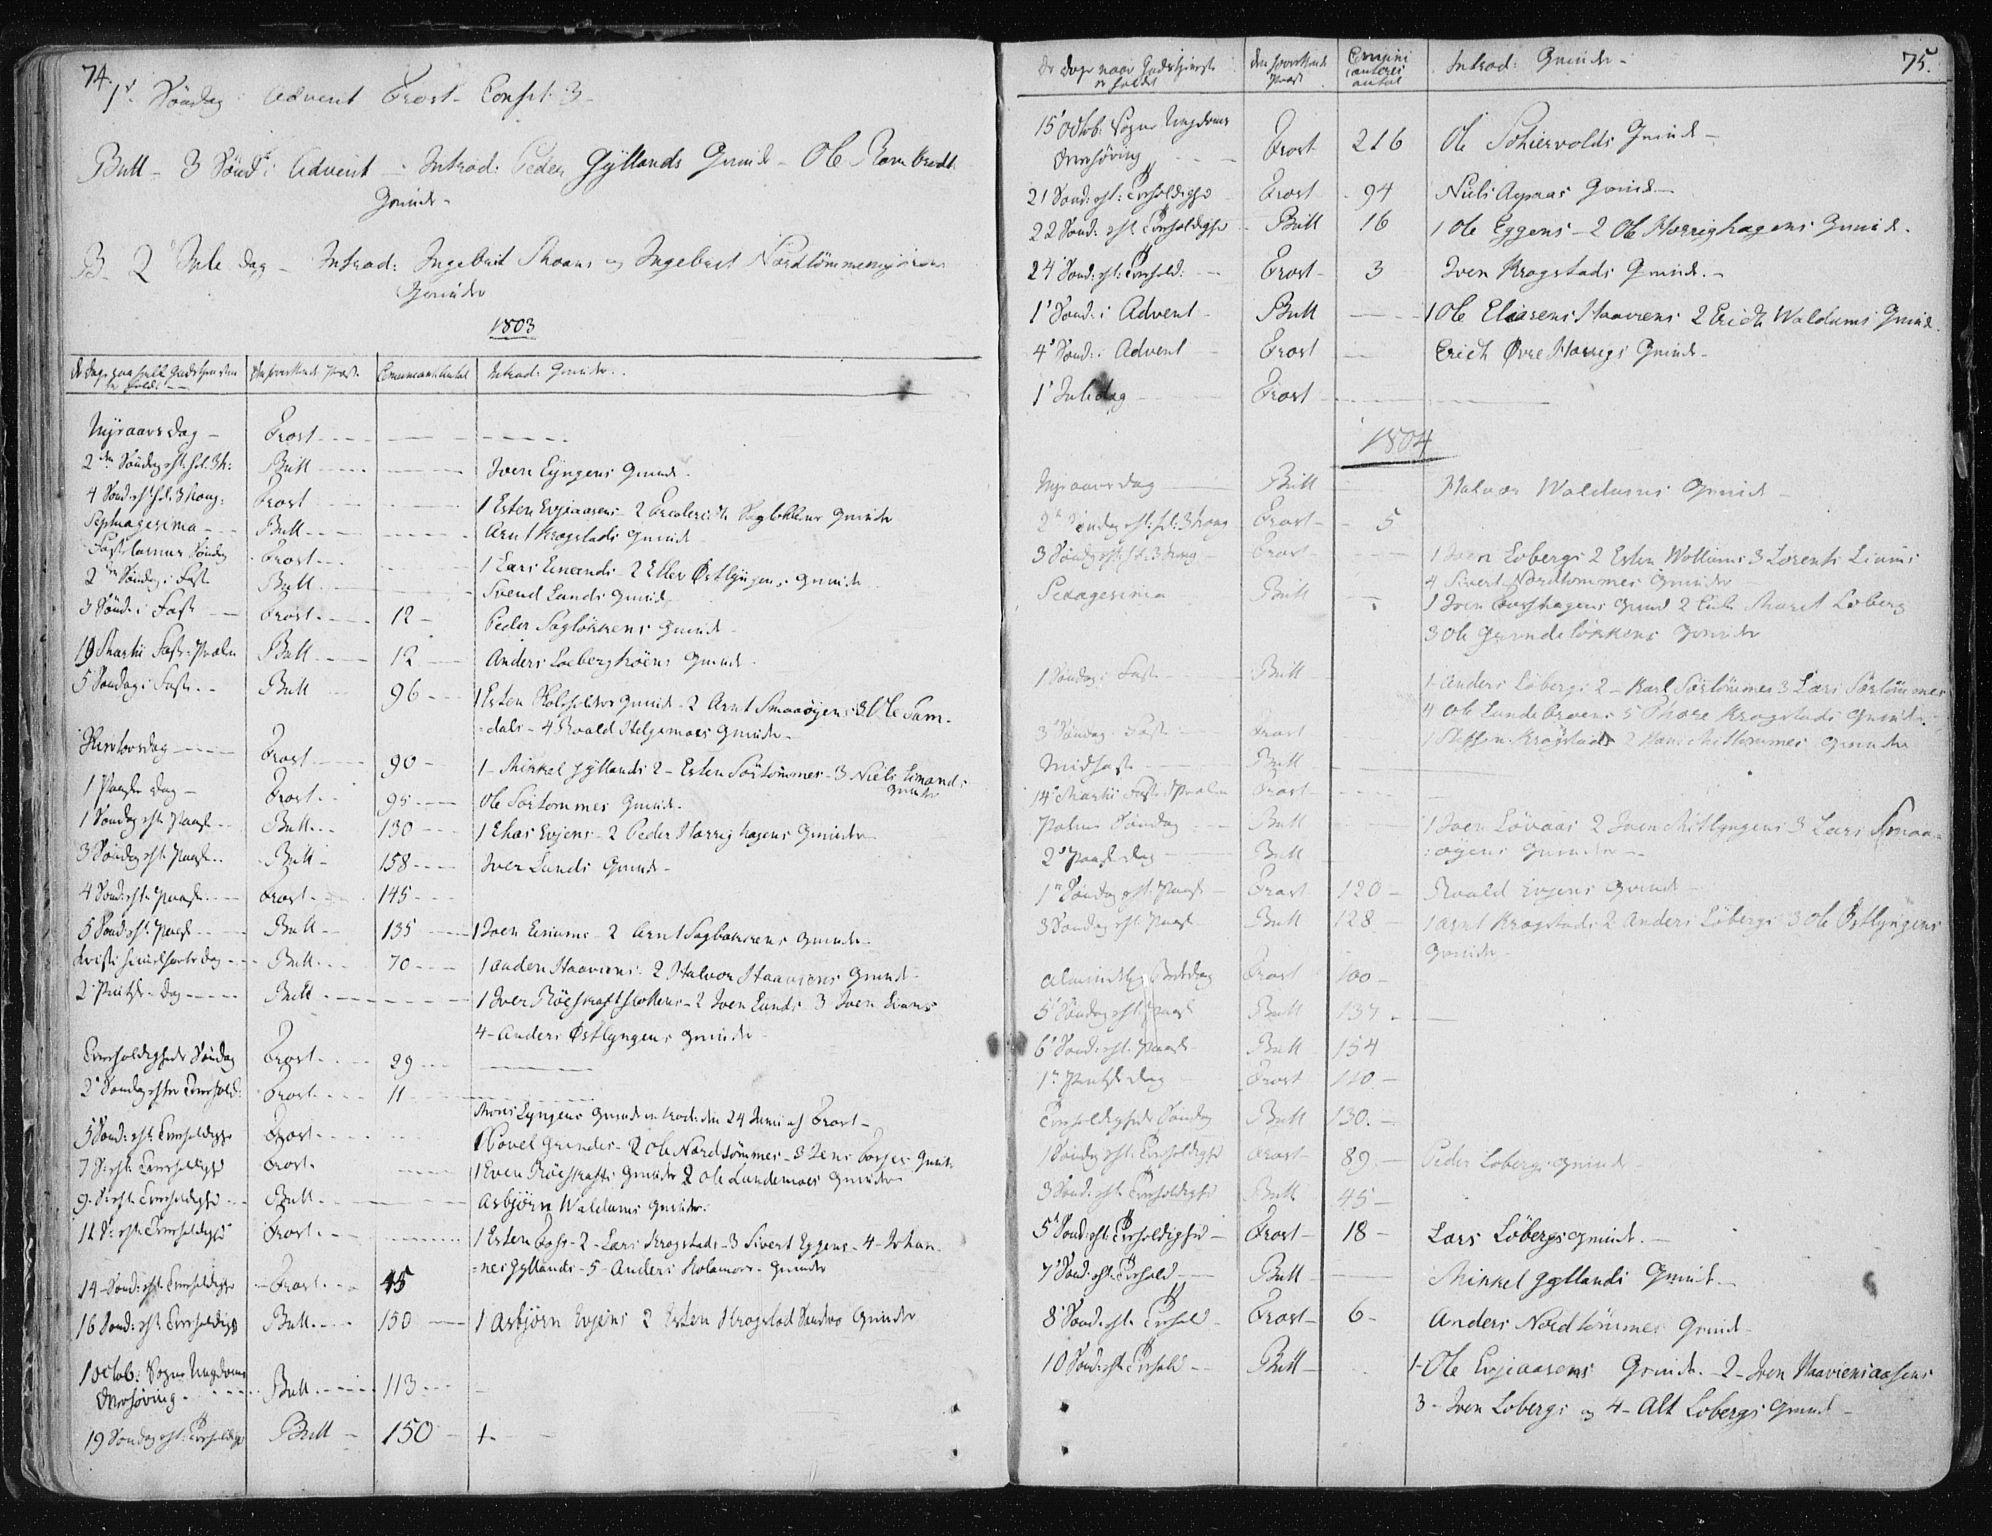 SAT, Ministerialprotokoller, klokkerbøker og fødselsregistre - Sør-Trøndelag, 687/L0993: Parish register (official) no. 687A03 /2, 1788-1815, p. 74-75